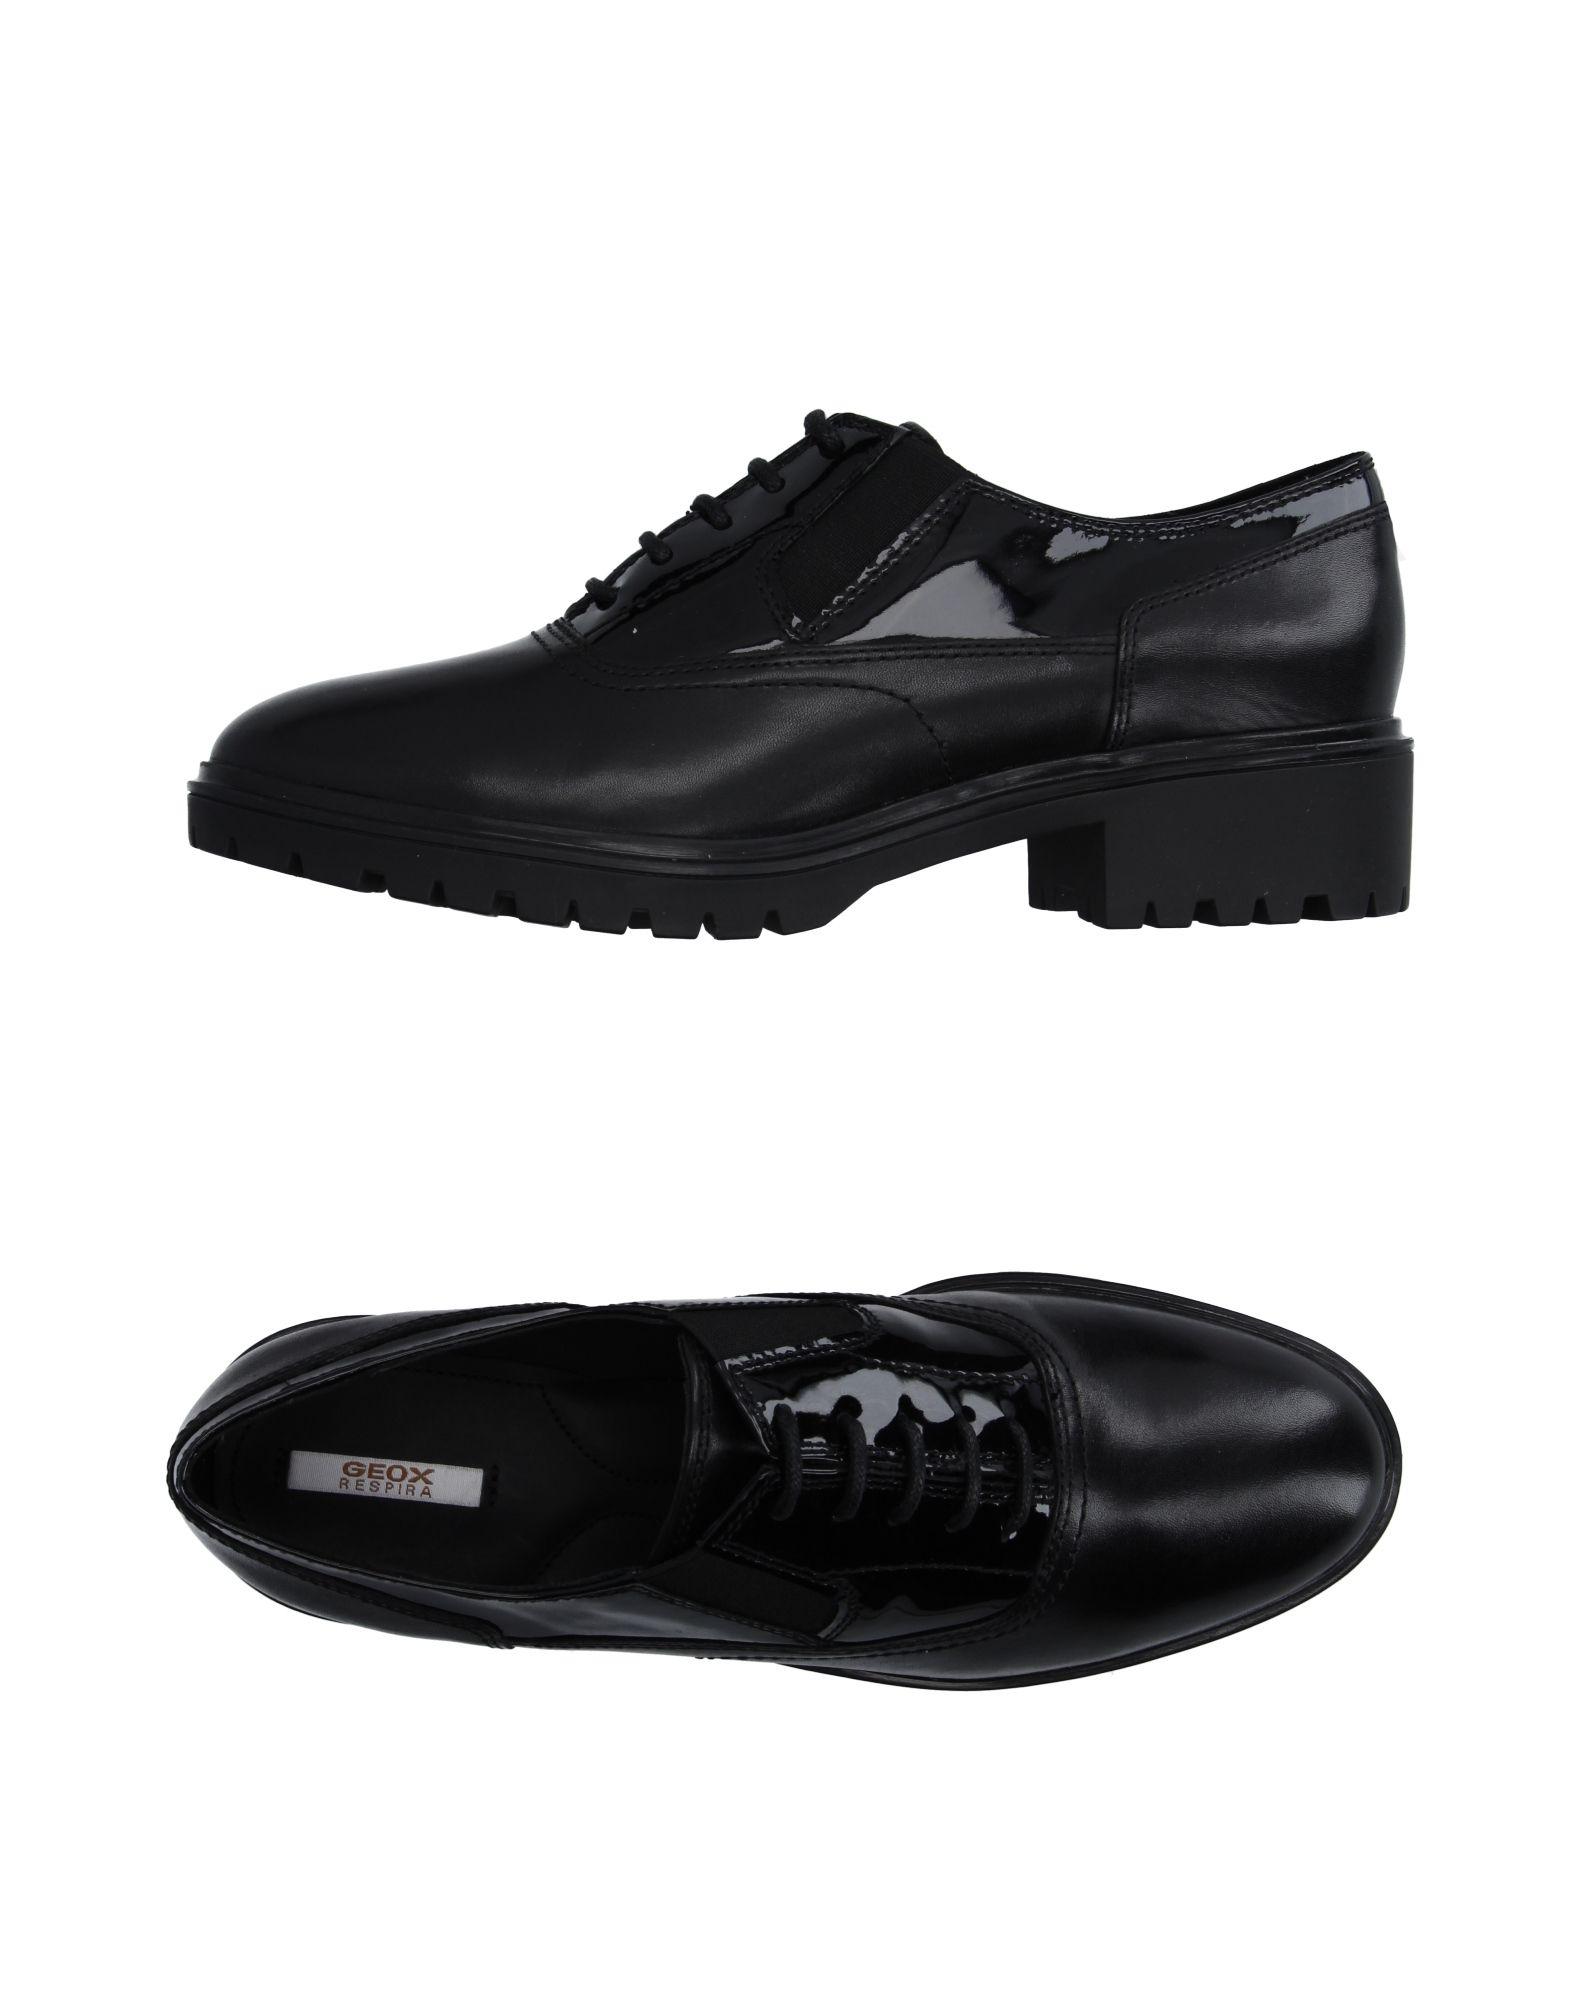 Geox Schnürschuhe Damen  11110900QJ Gute Qualität beliebte Schuhe